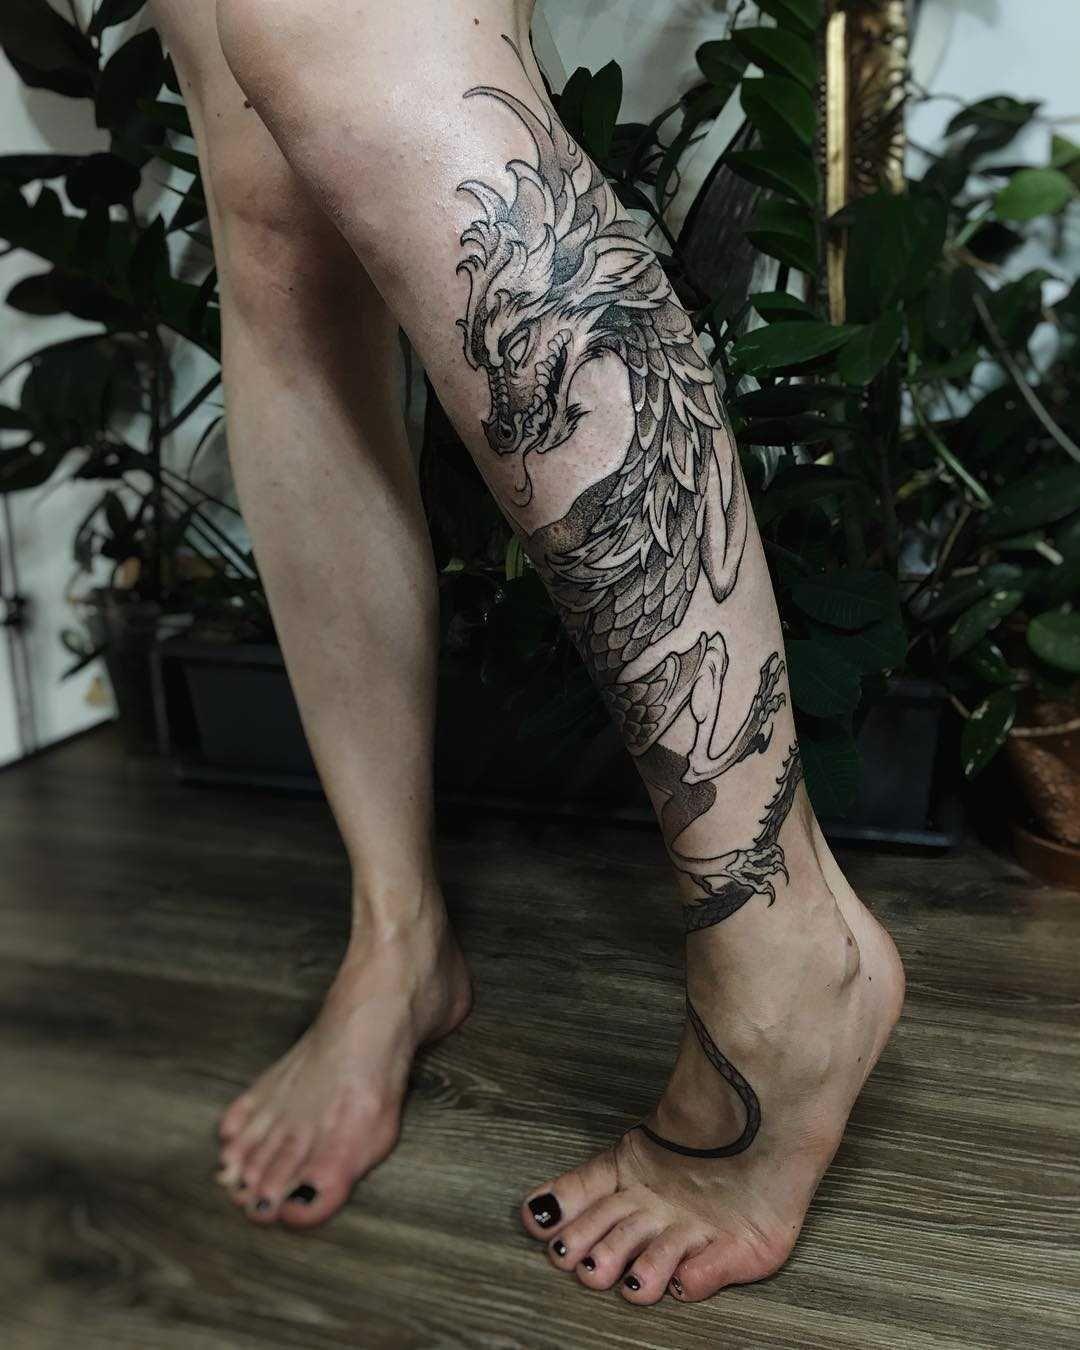 Cool Dragon Tattoo On The Left Calf Dragon Tattoo Leg Dragon Tattoo Wrapped Around Arm Dragon Tattoo Calf